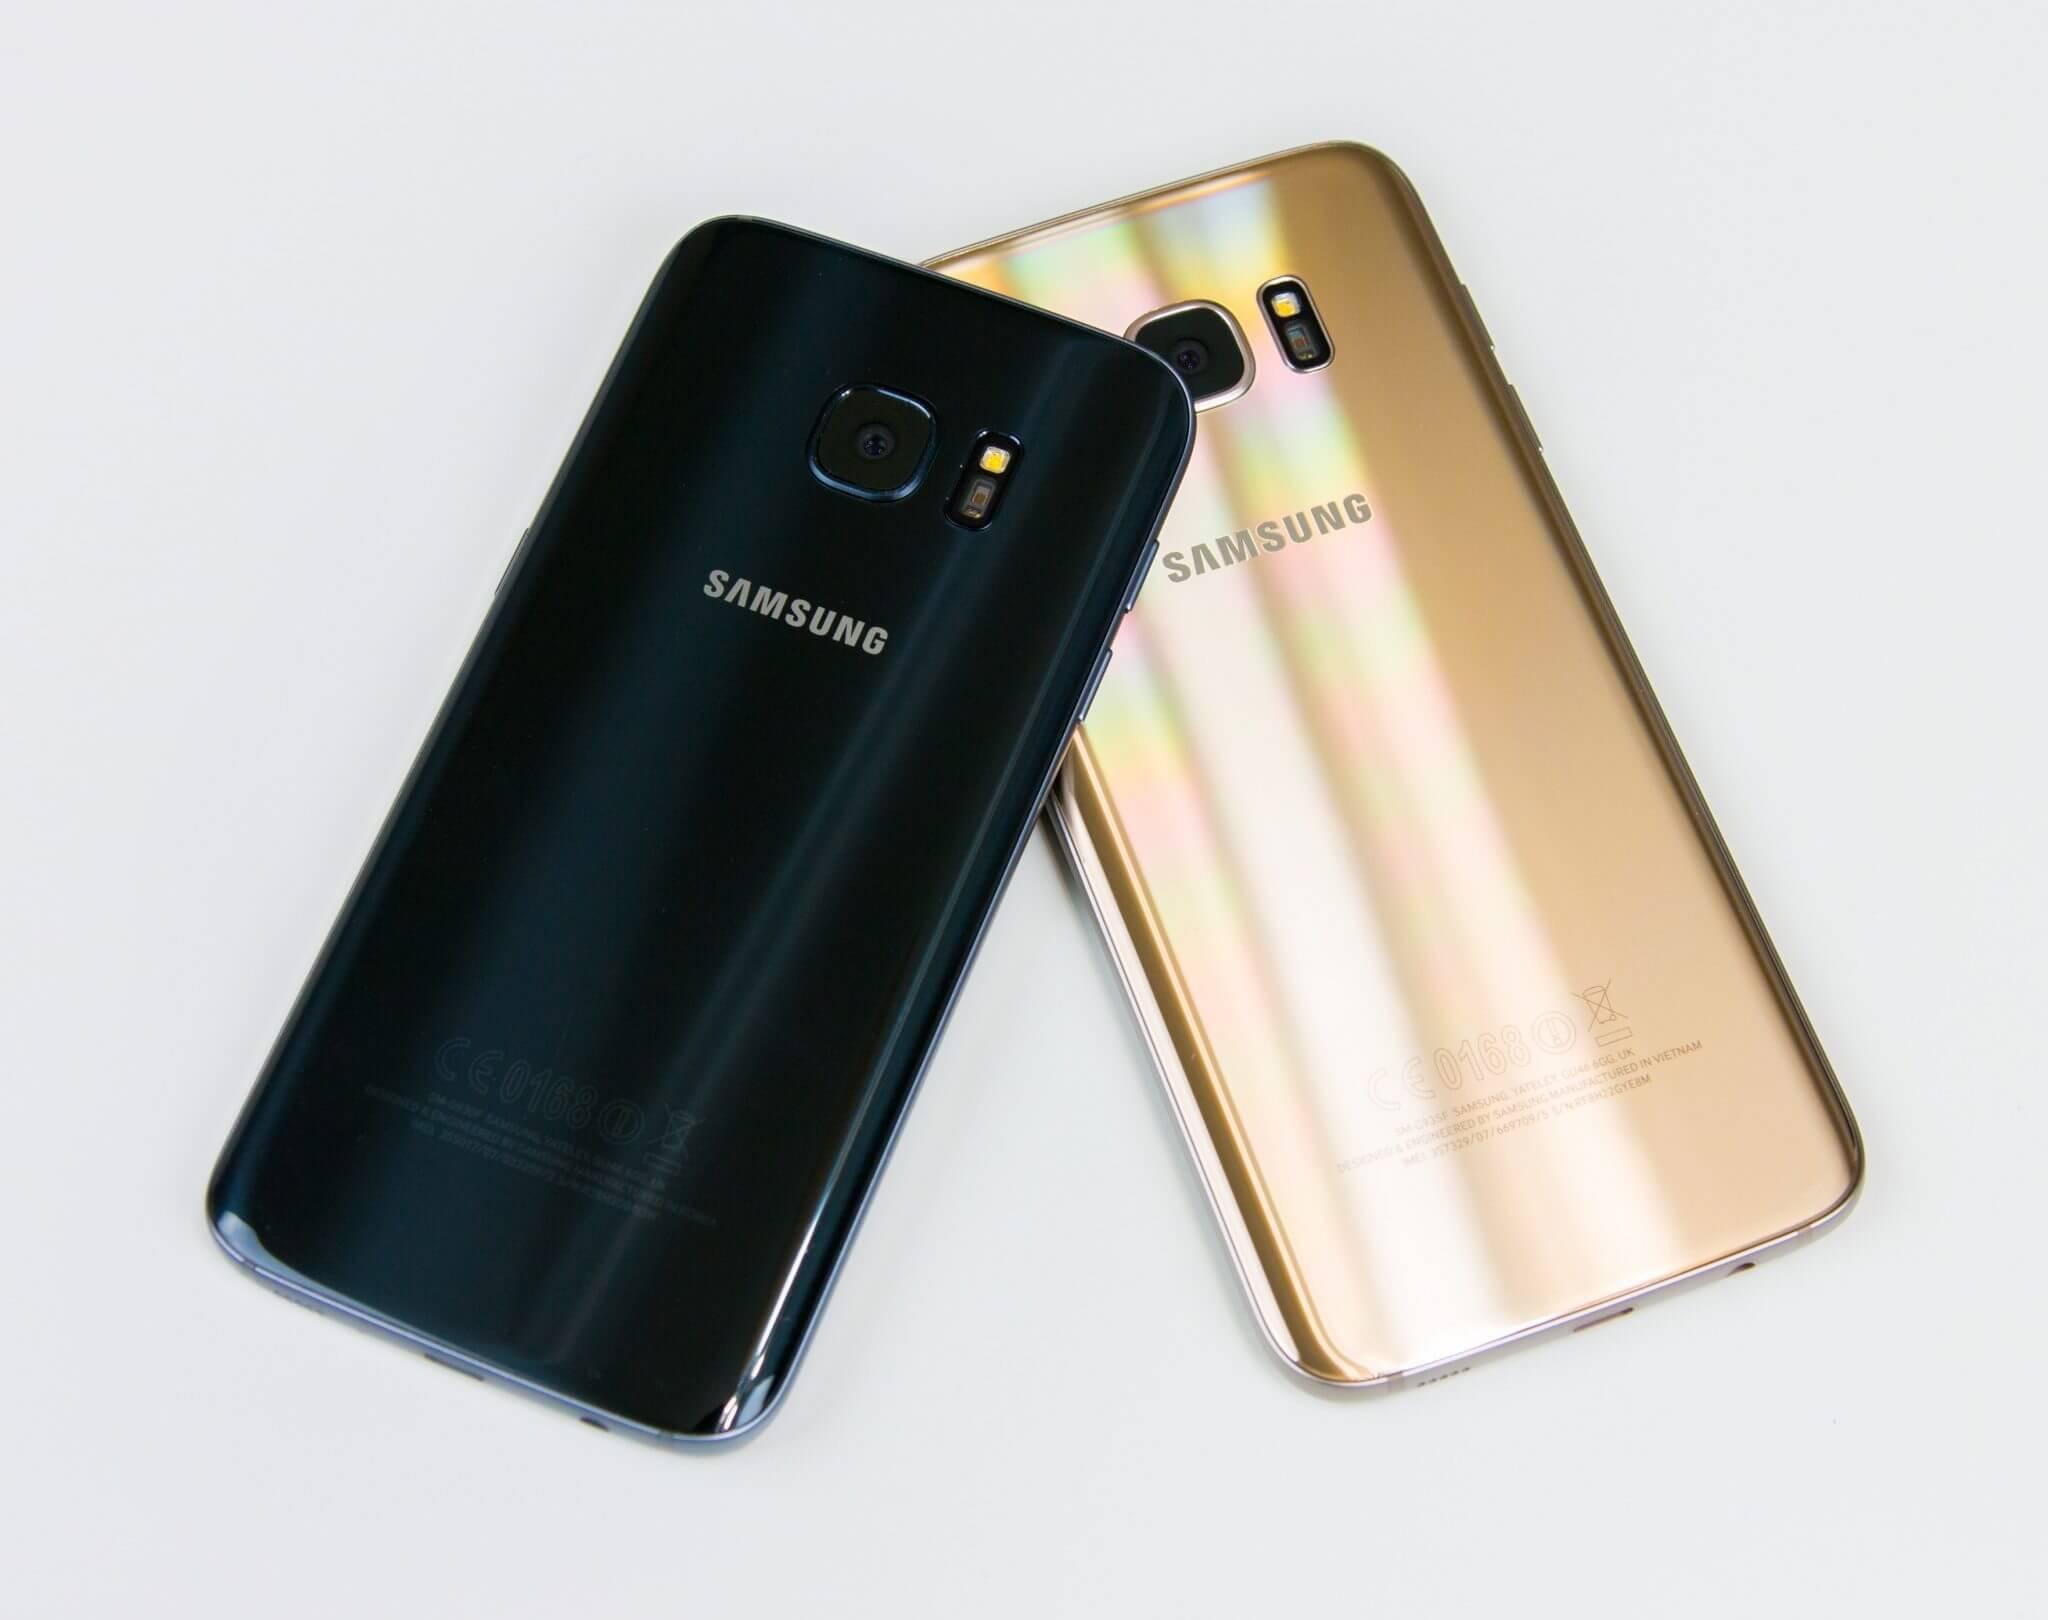 Samsung galaxy s7 vs s7 edge 11